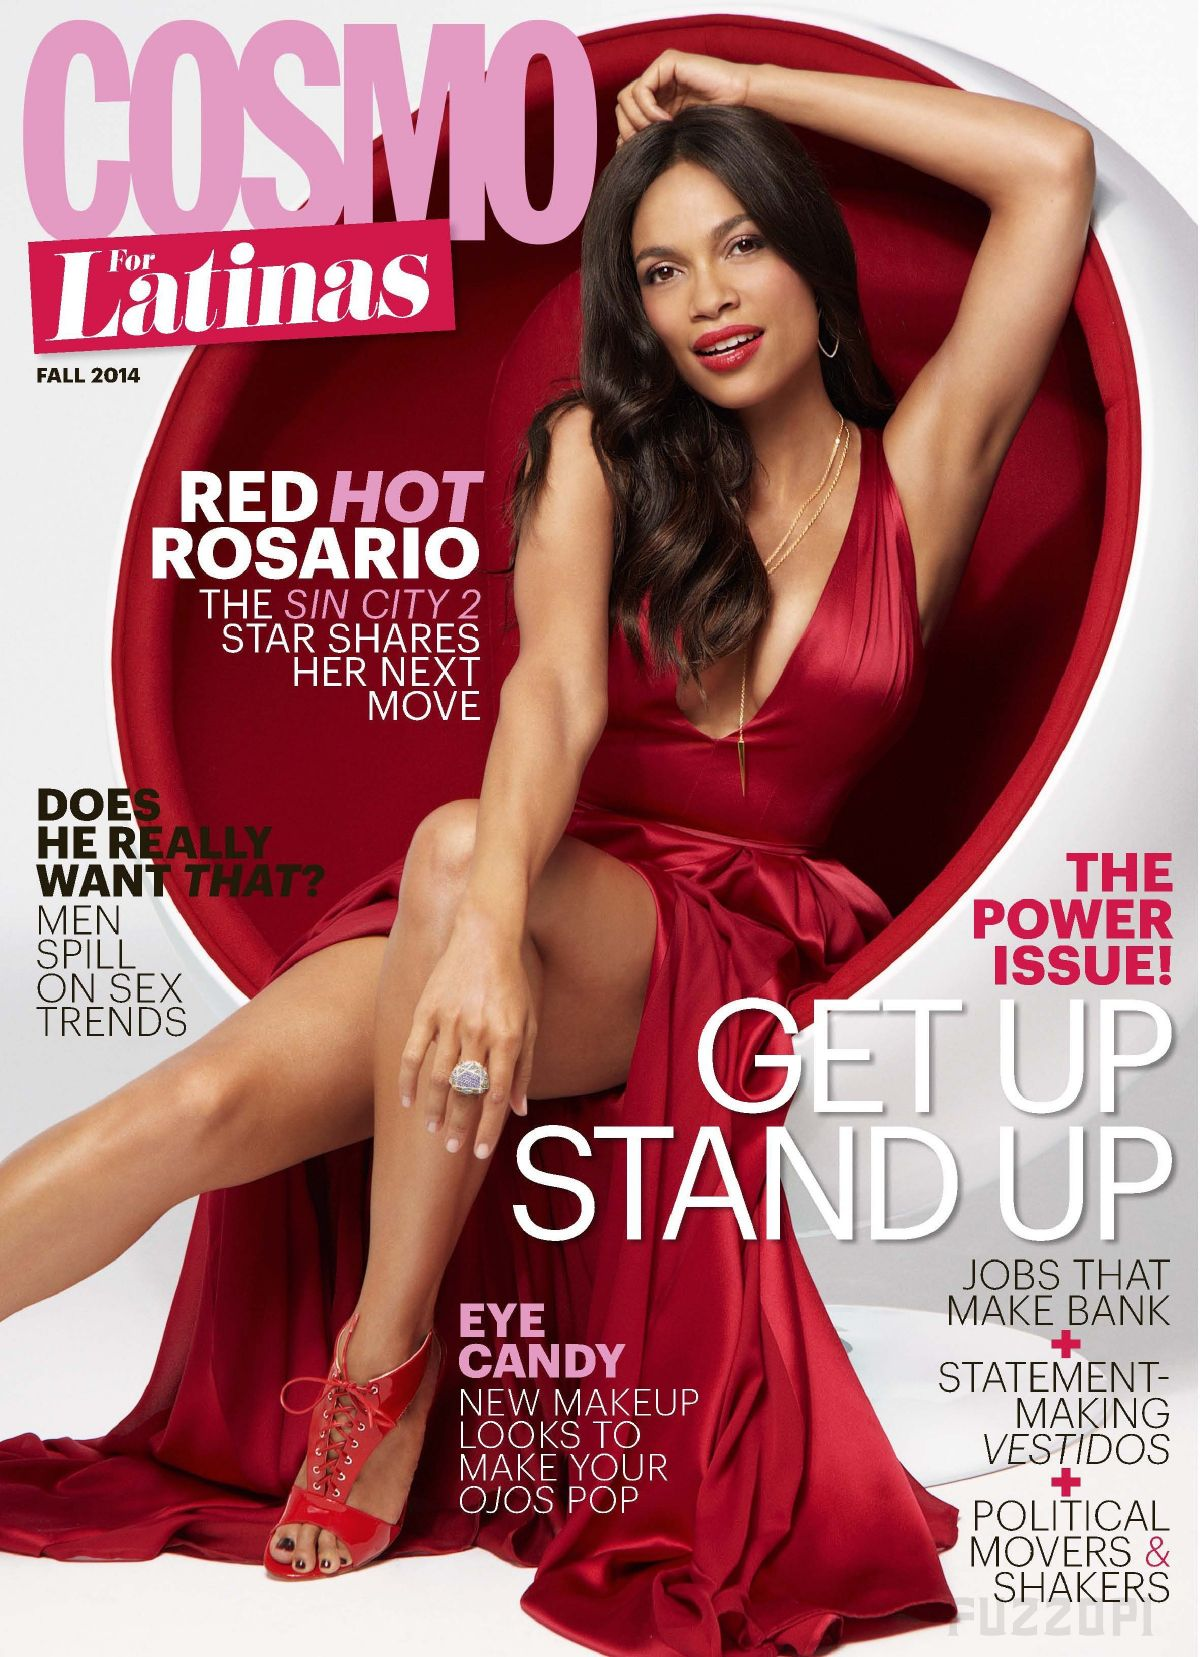 ROSARIO DAWSON in Cosmopolitan for Latinas Magazine, October 2014 Issue